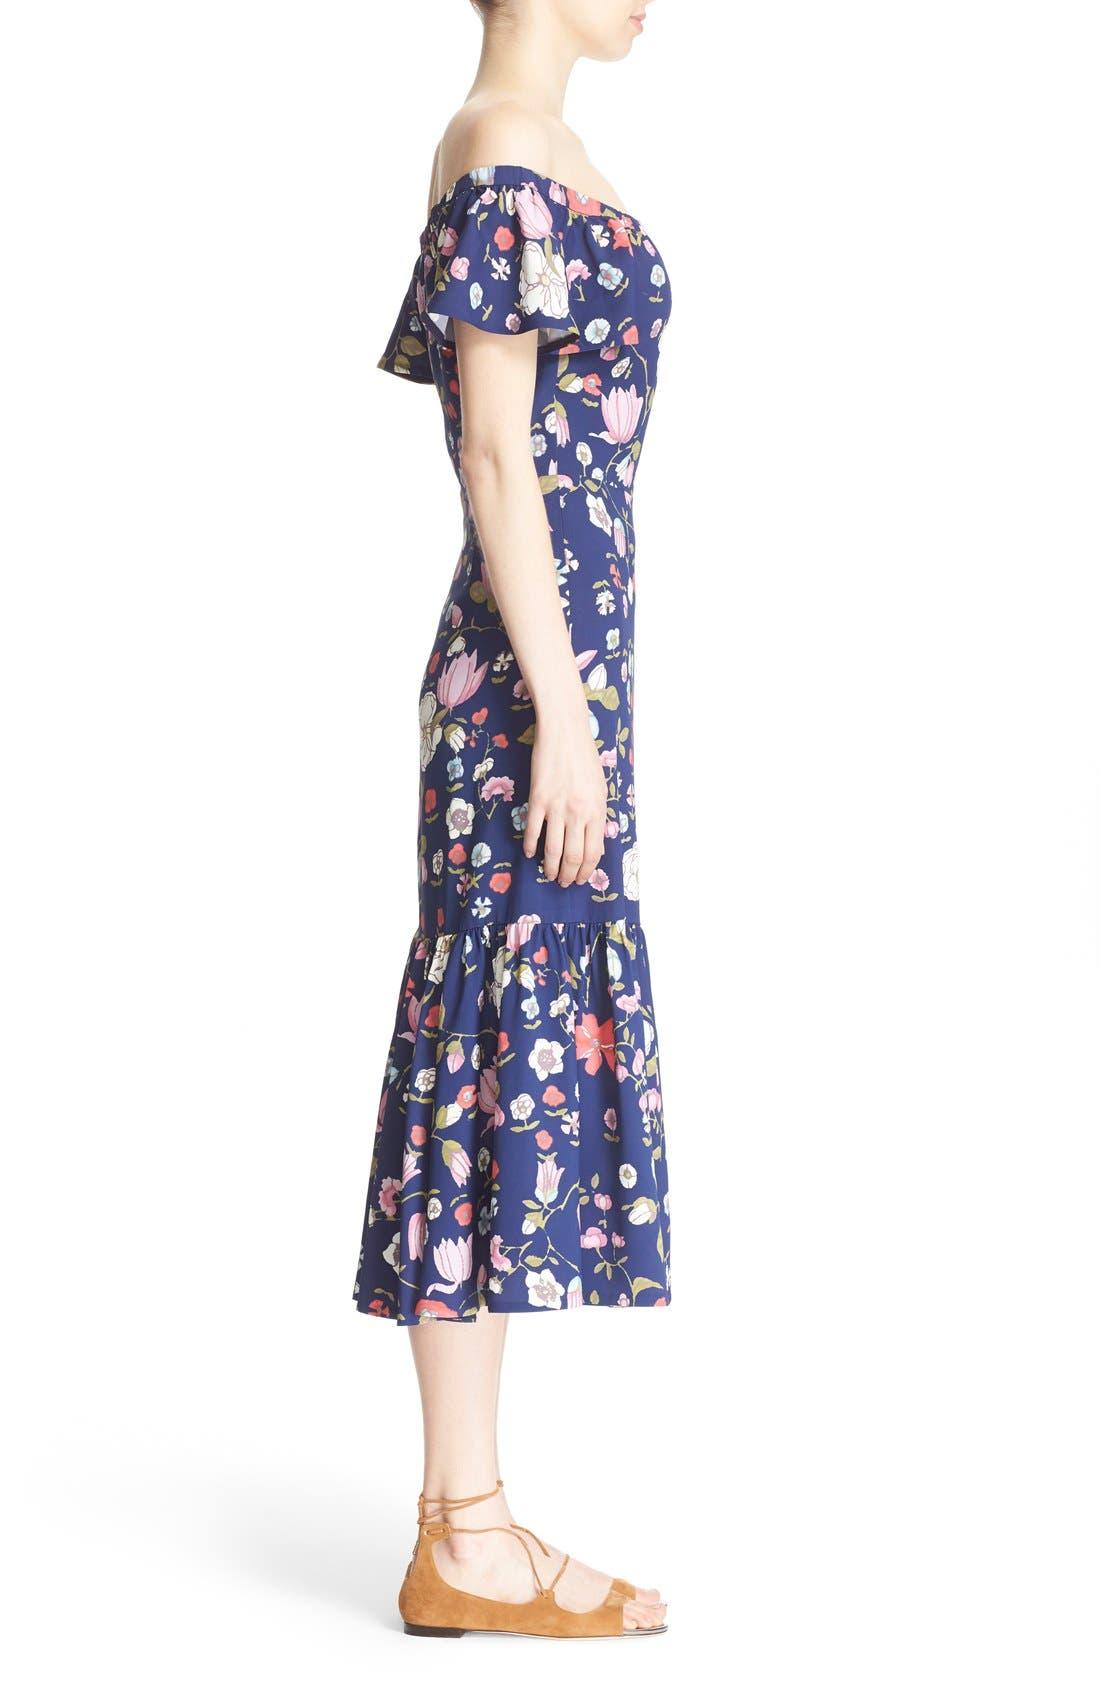 REBECCA TAYLOR, Off the Shoulder Floral Print Dress, Alternate thumbnail 4, color, 510